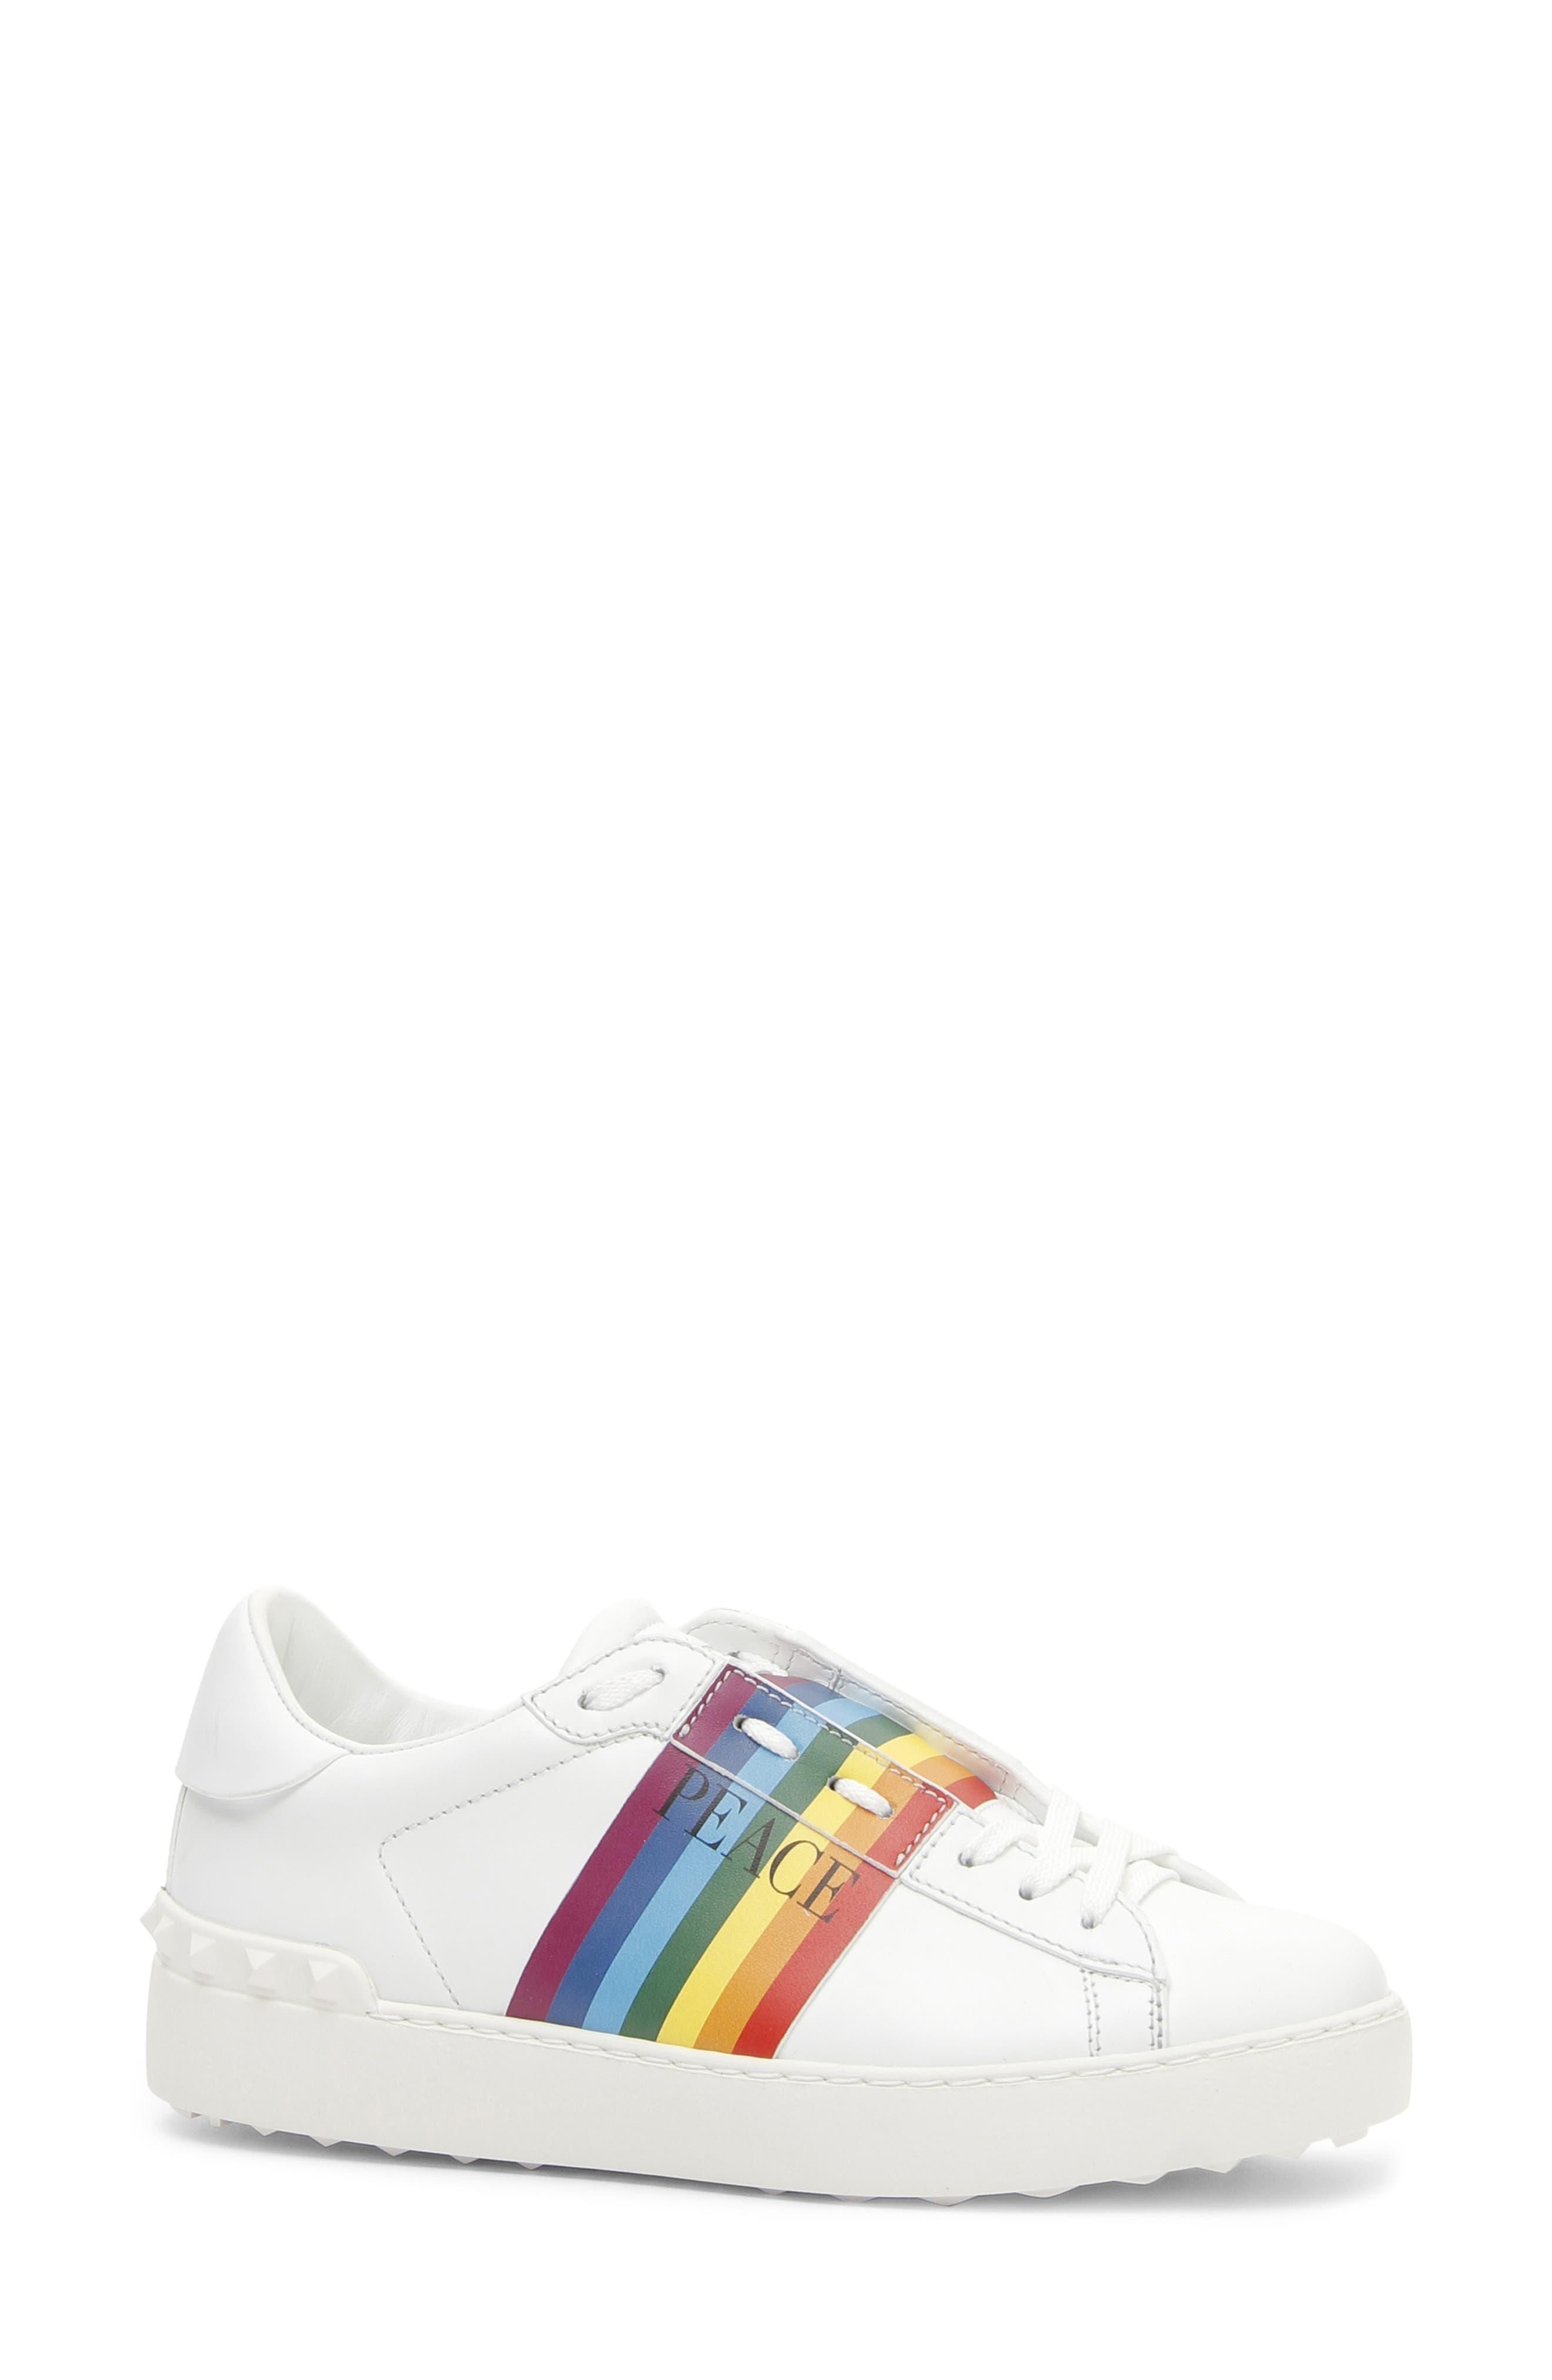 VALENTINO GARAVANI,                             Rainbow Peace Sneaker,                             Main thumbnail 1, color,                             WHITE/ RAINBOW